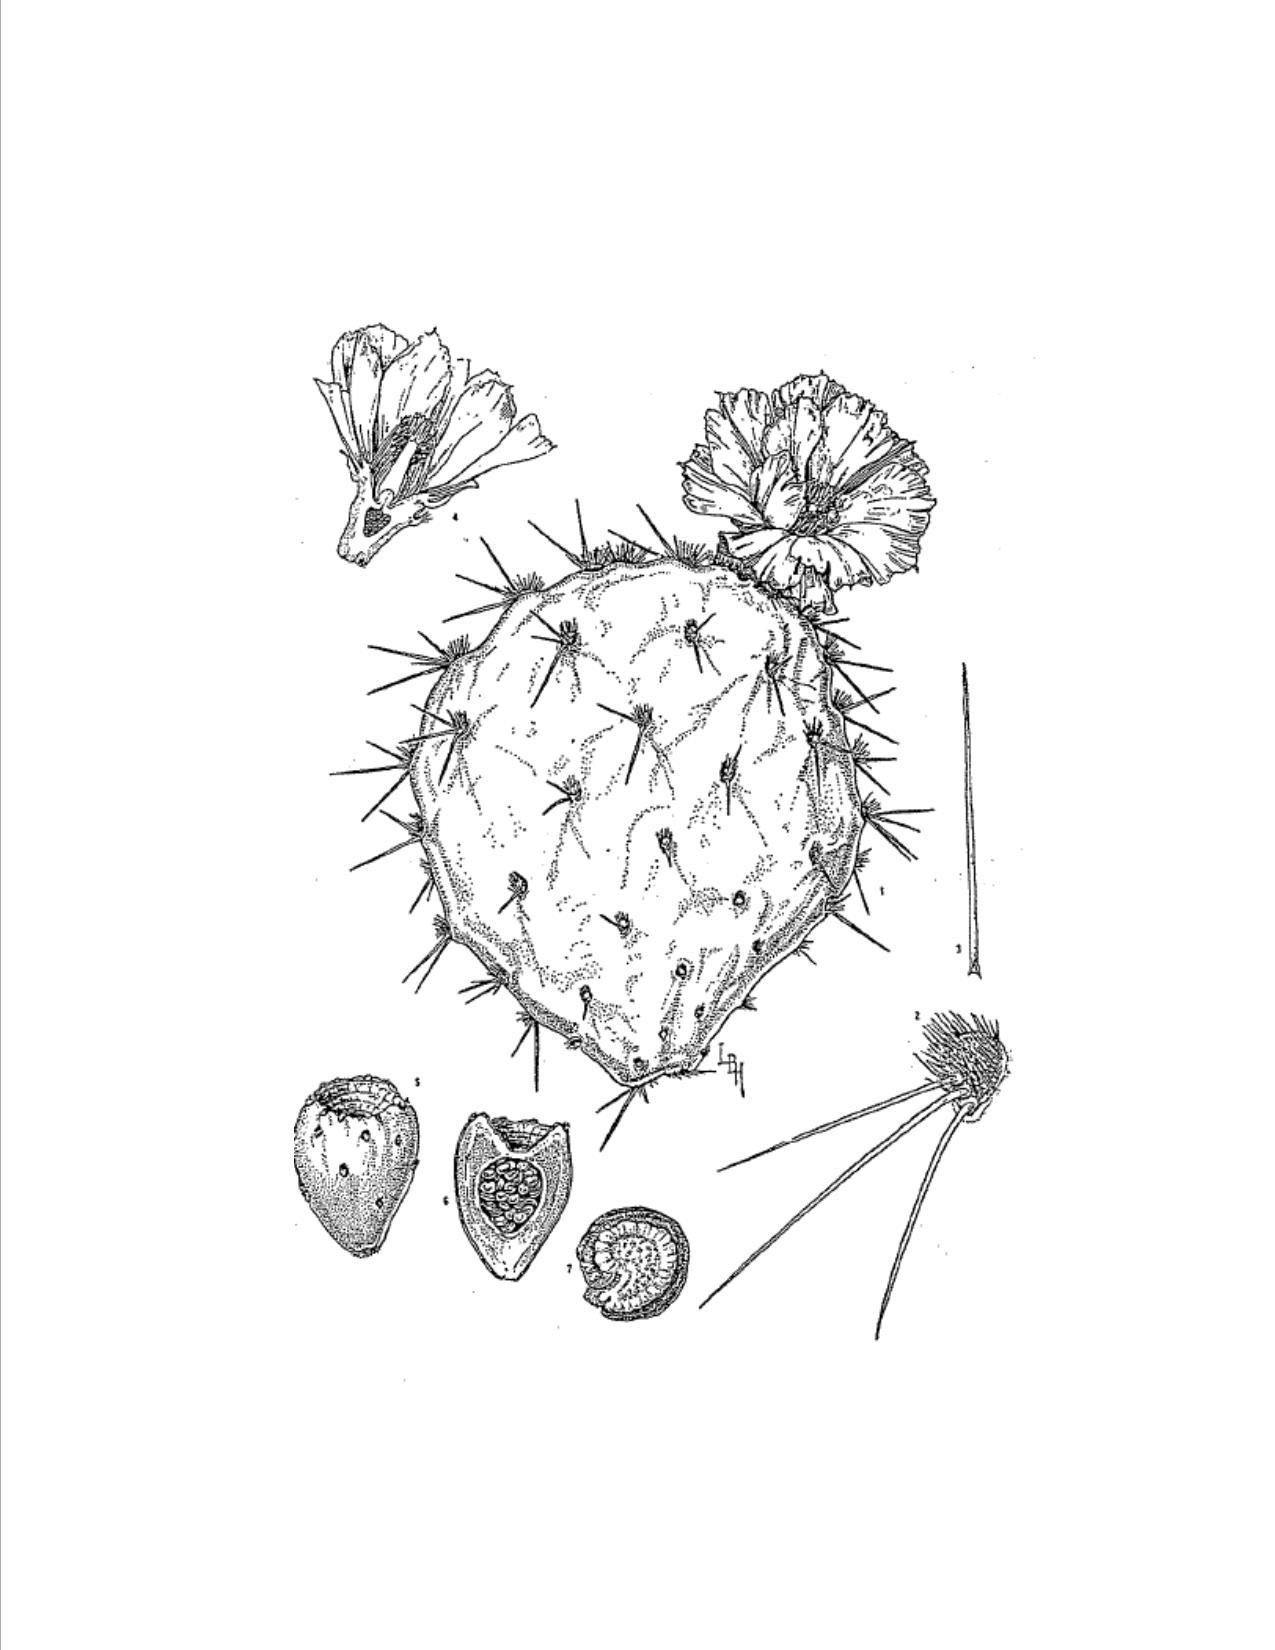 Botanical Illustration by Lucretia B Hamilton